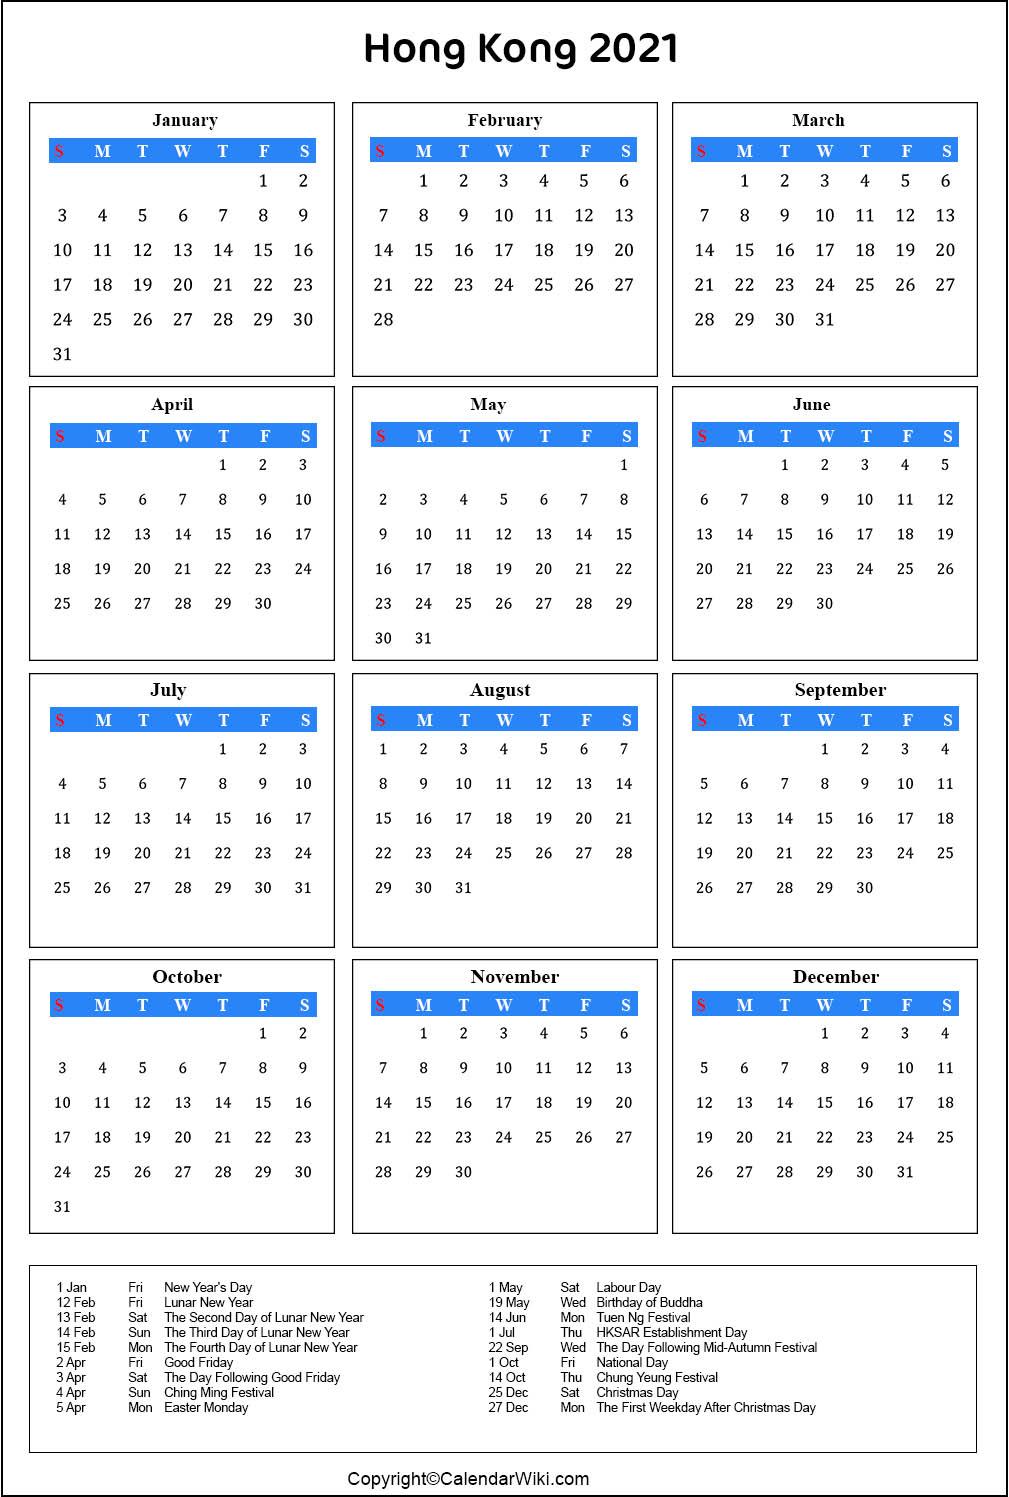 Printable Hongkong Calendar 2021 With Holidays [Public pertaining to Important Awarness Dates 2021 Australia